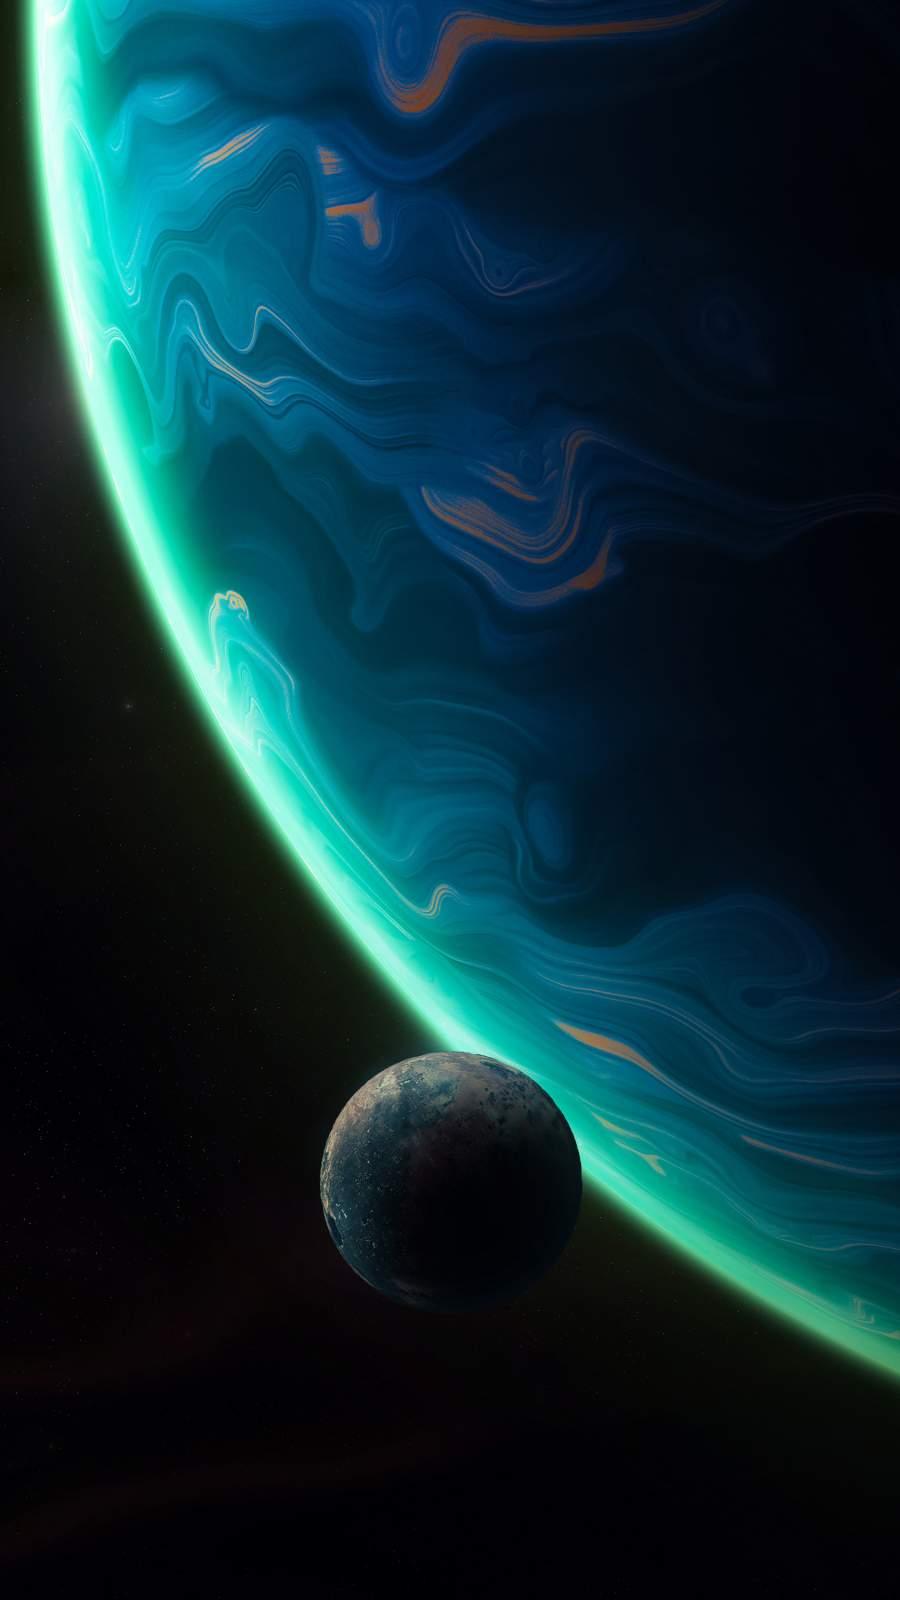 Moon Planet iPhone Wallpaper